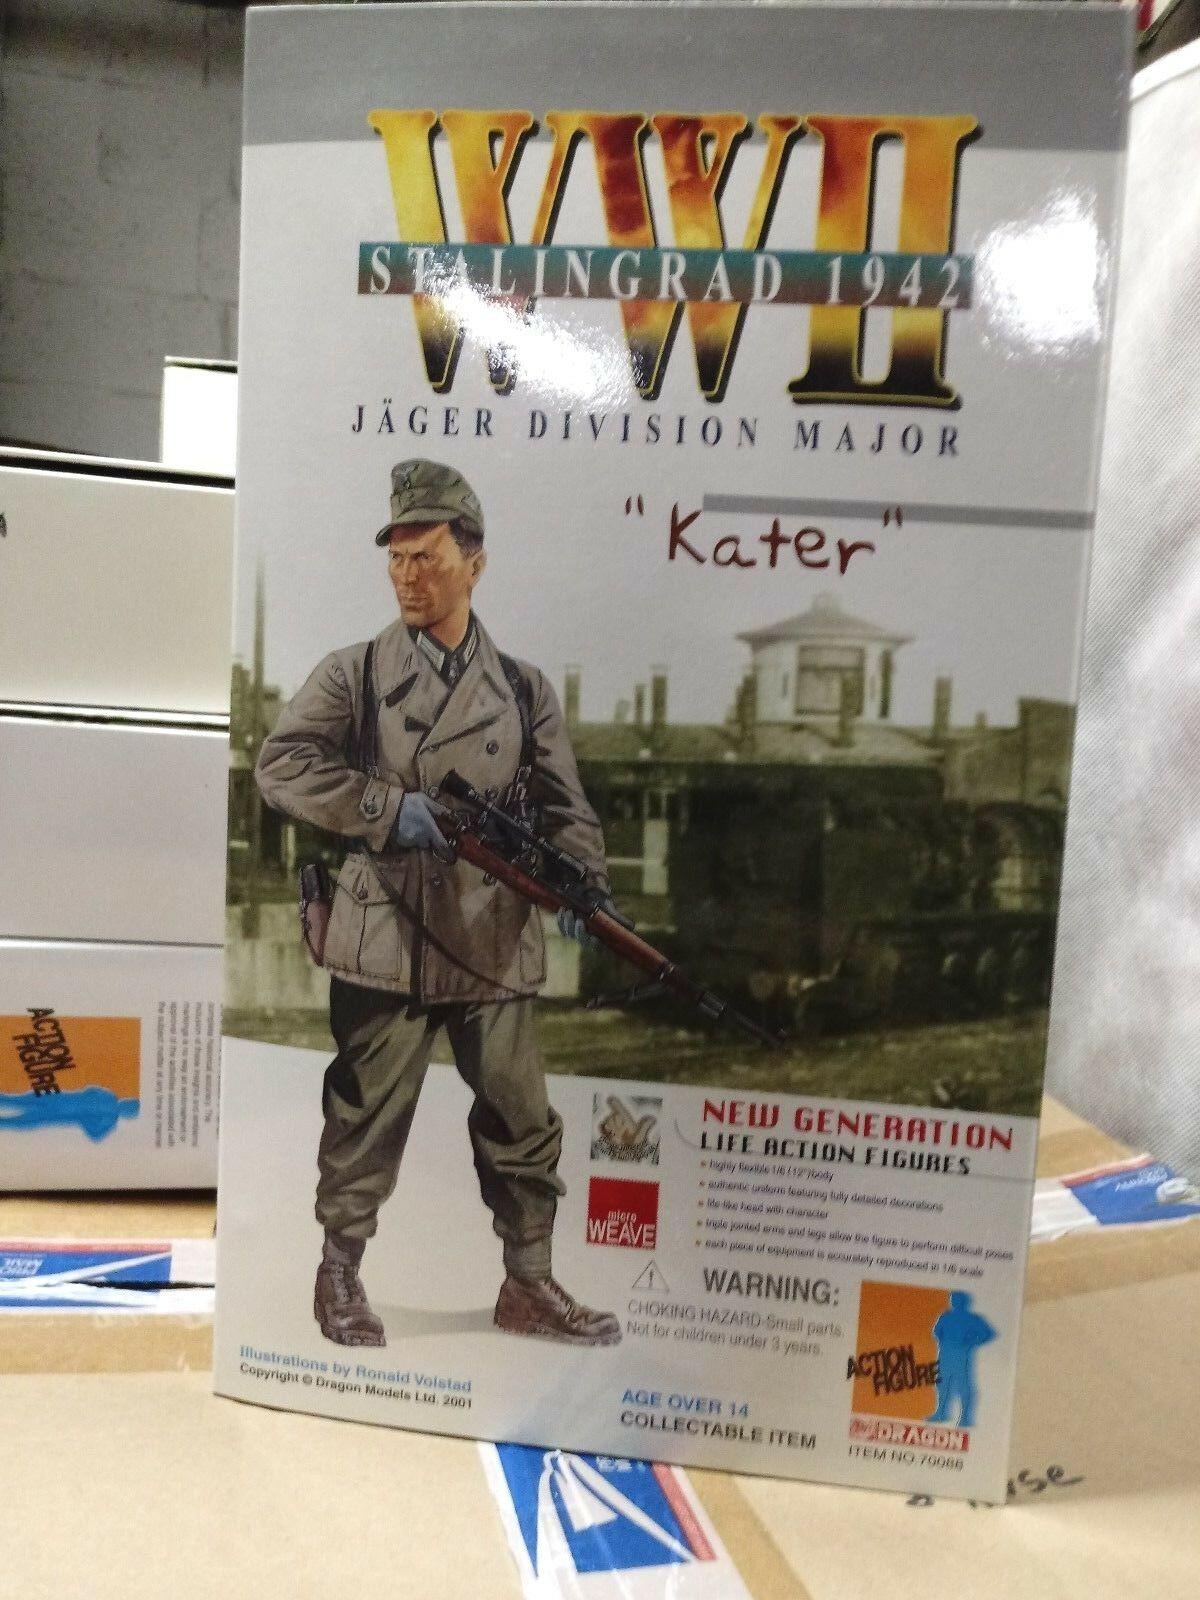 WW2  Army Jager Major Kater Sniper at Stalingrad 1942 1/6 Ed Harris